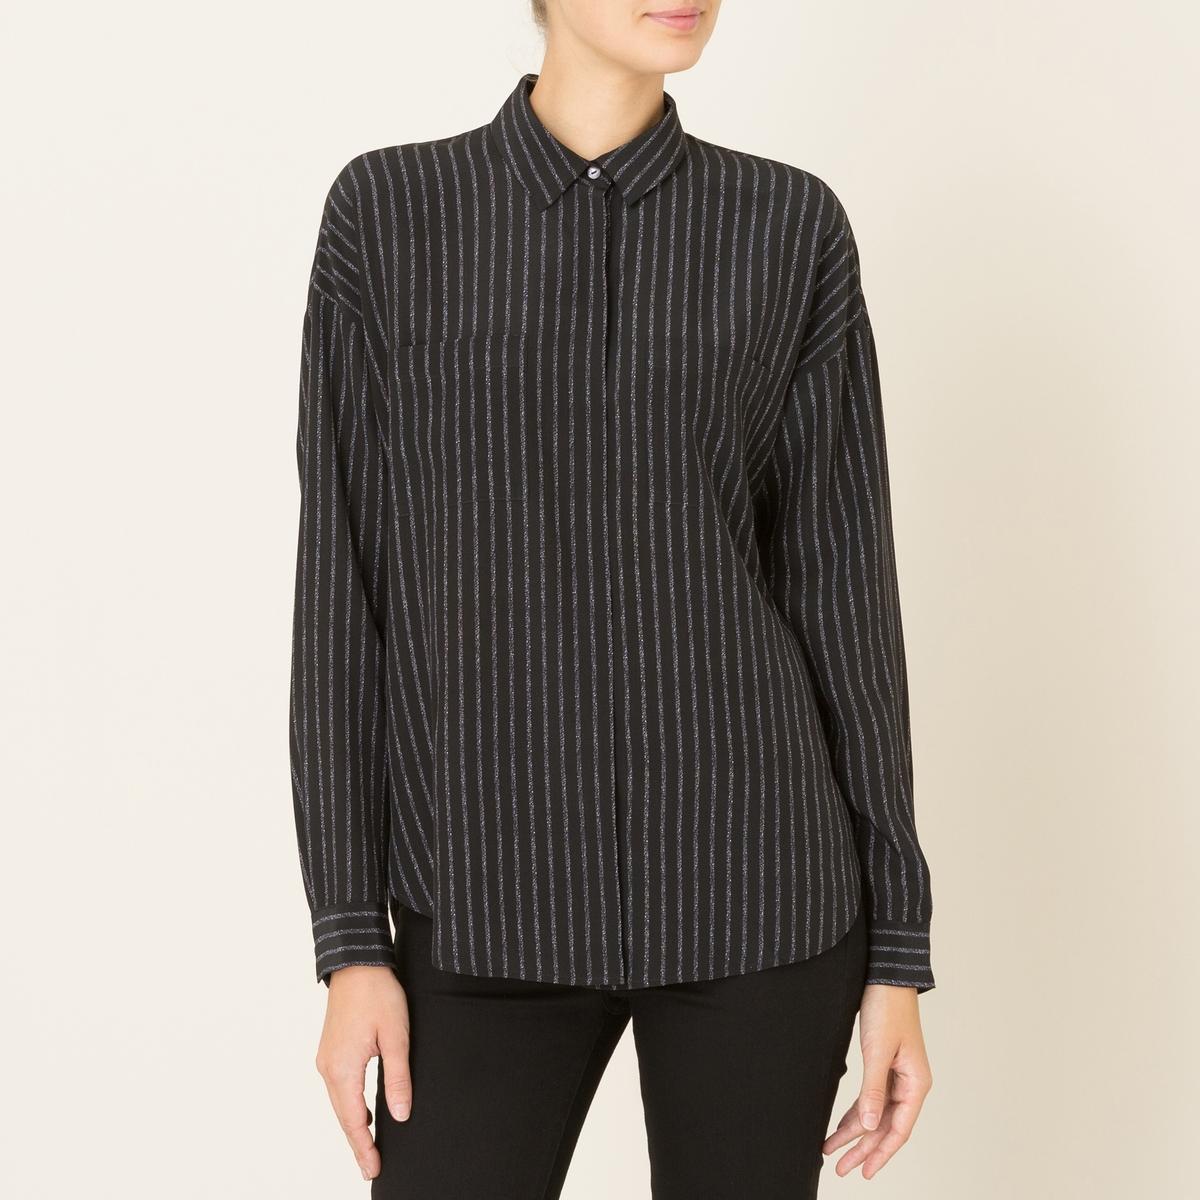 Рубашка женская из шелка женская рубашка feelroom